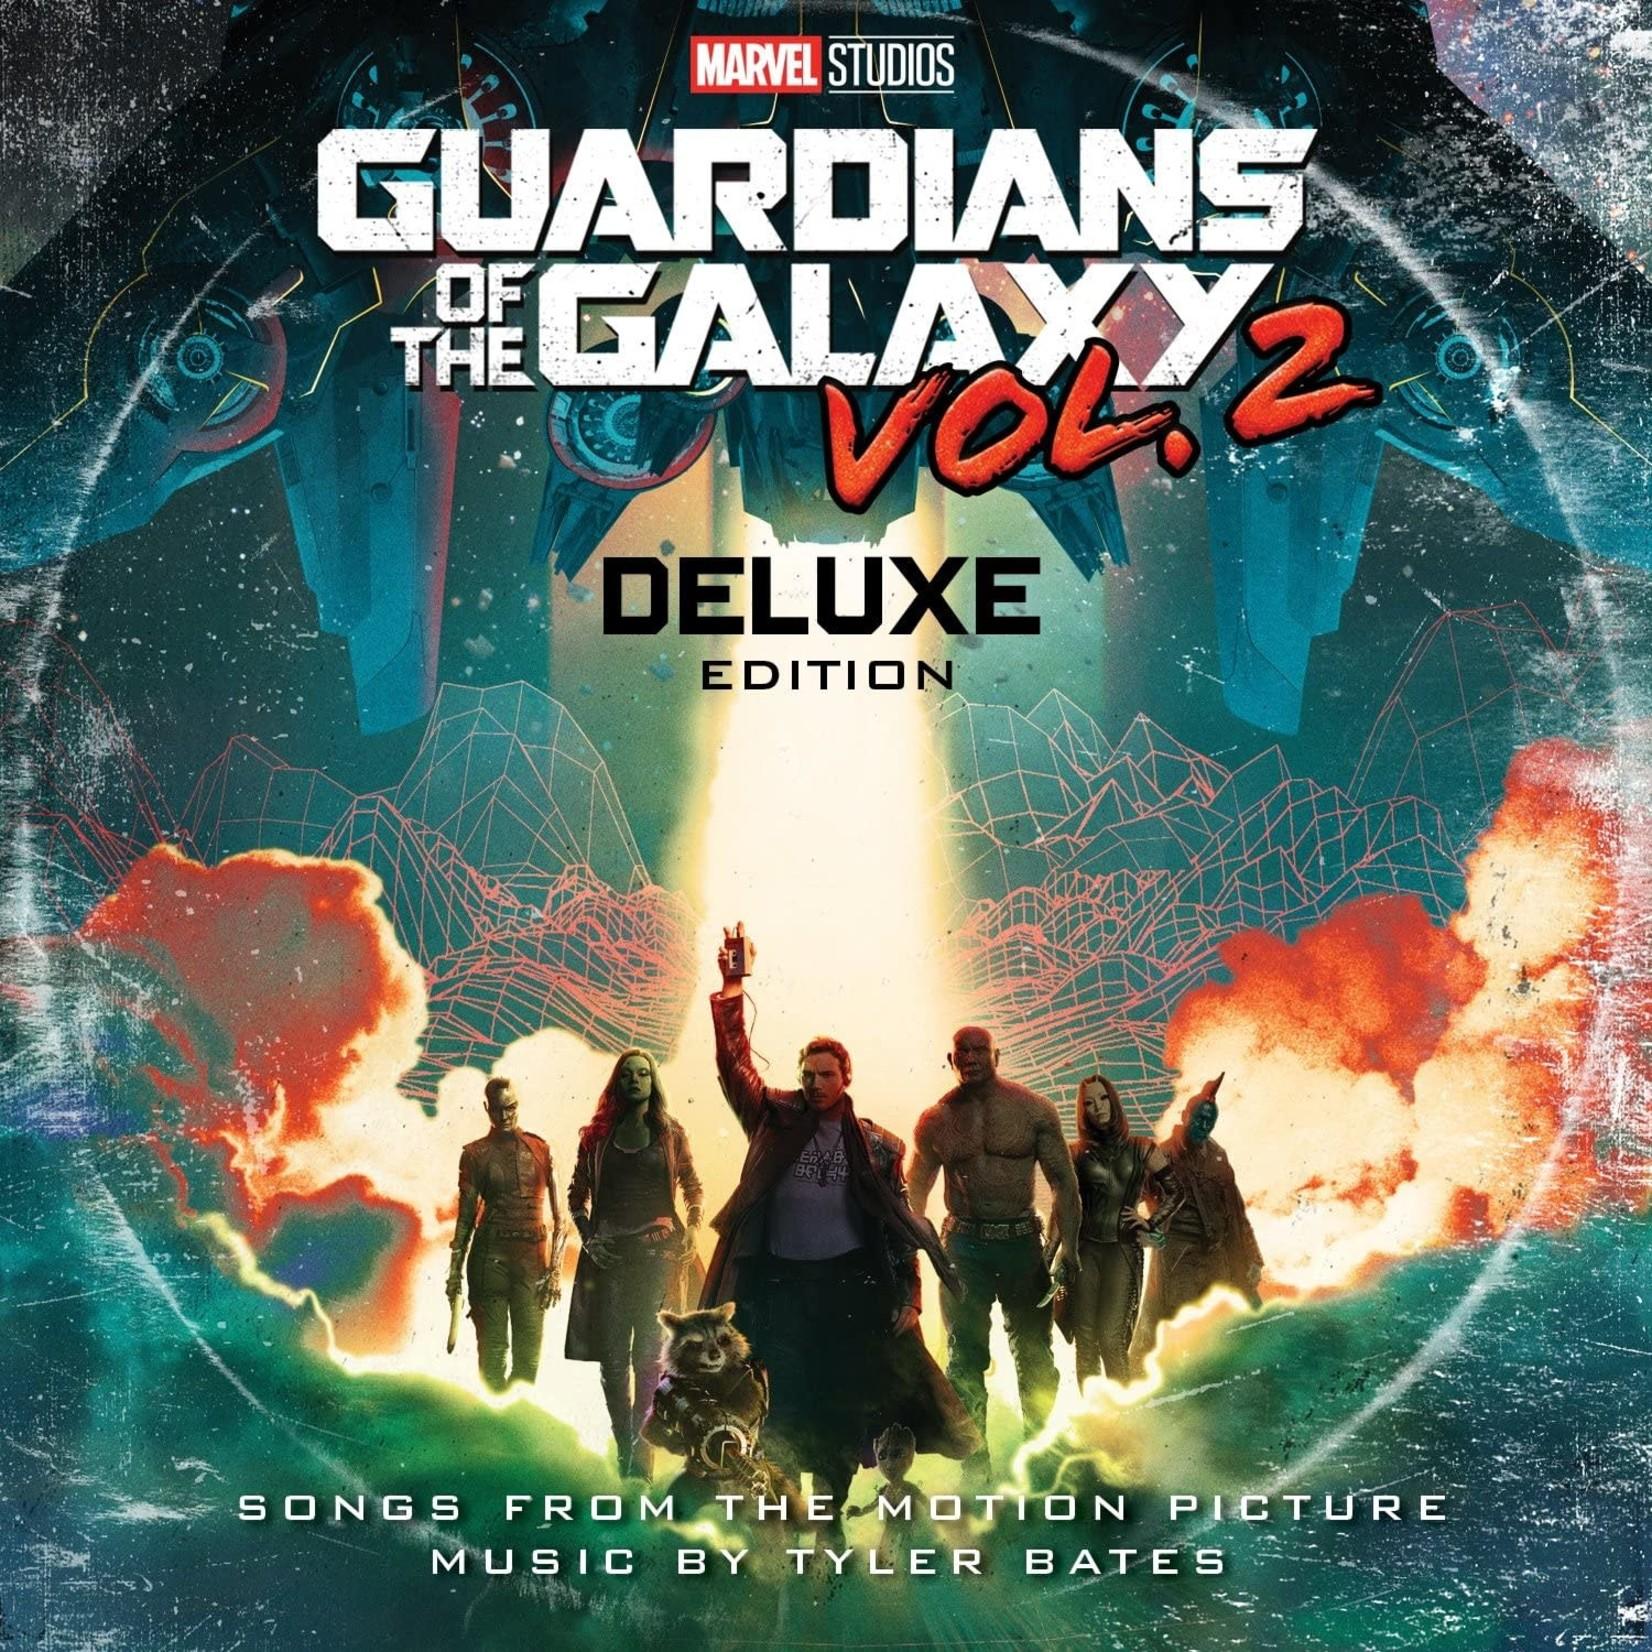 Vinyl Guardians of the Galaxy Vol.2 (Deluxe Edition) - Soundtrack